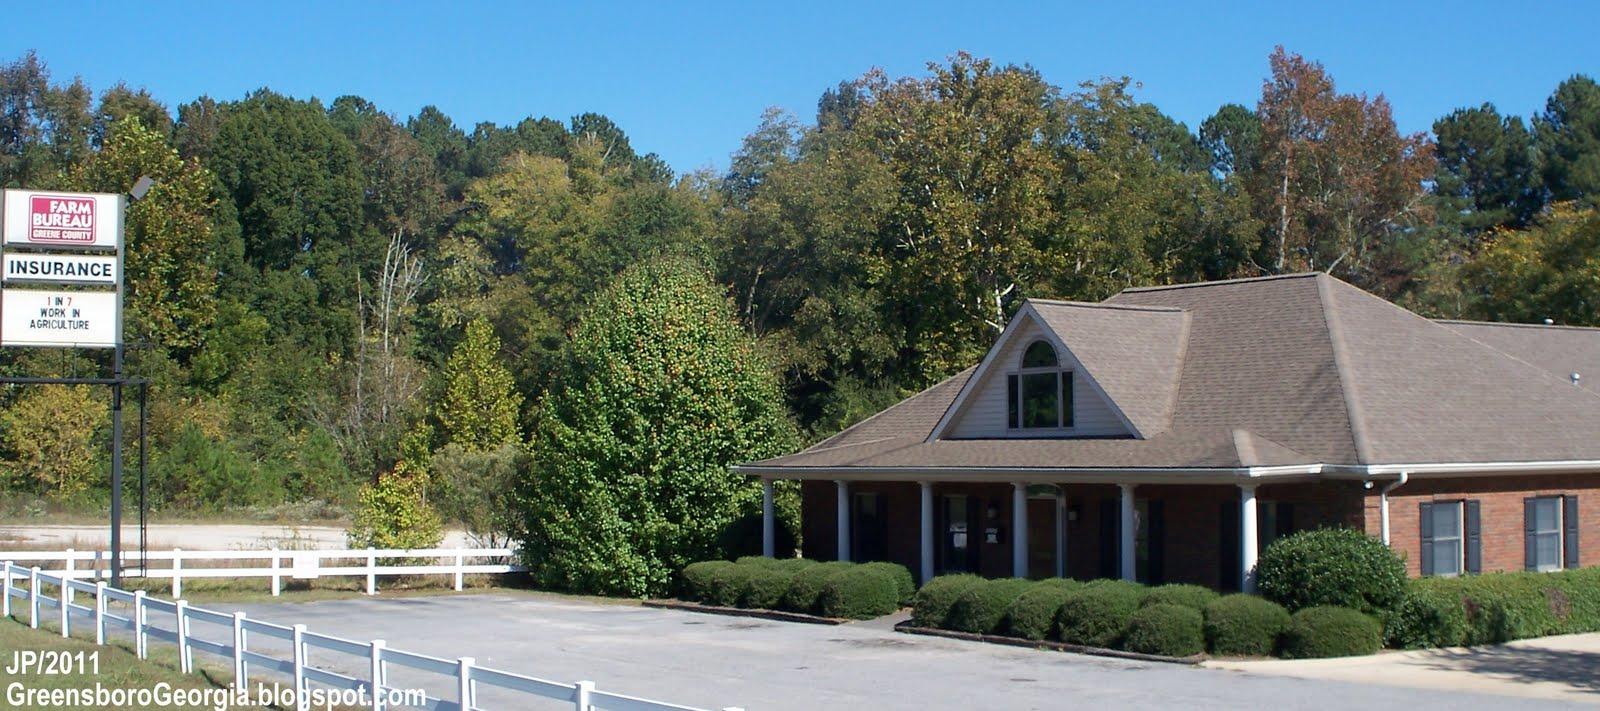 greensboro georgia greene lake oconee golf restaurant bank attorney hospital church dept store. Black Bedroom Furniture Sets. Home Design Ideas